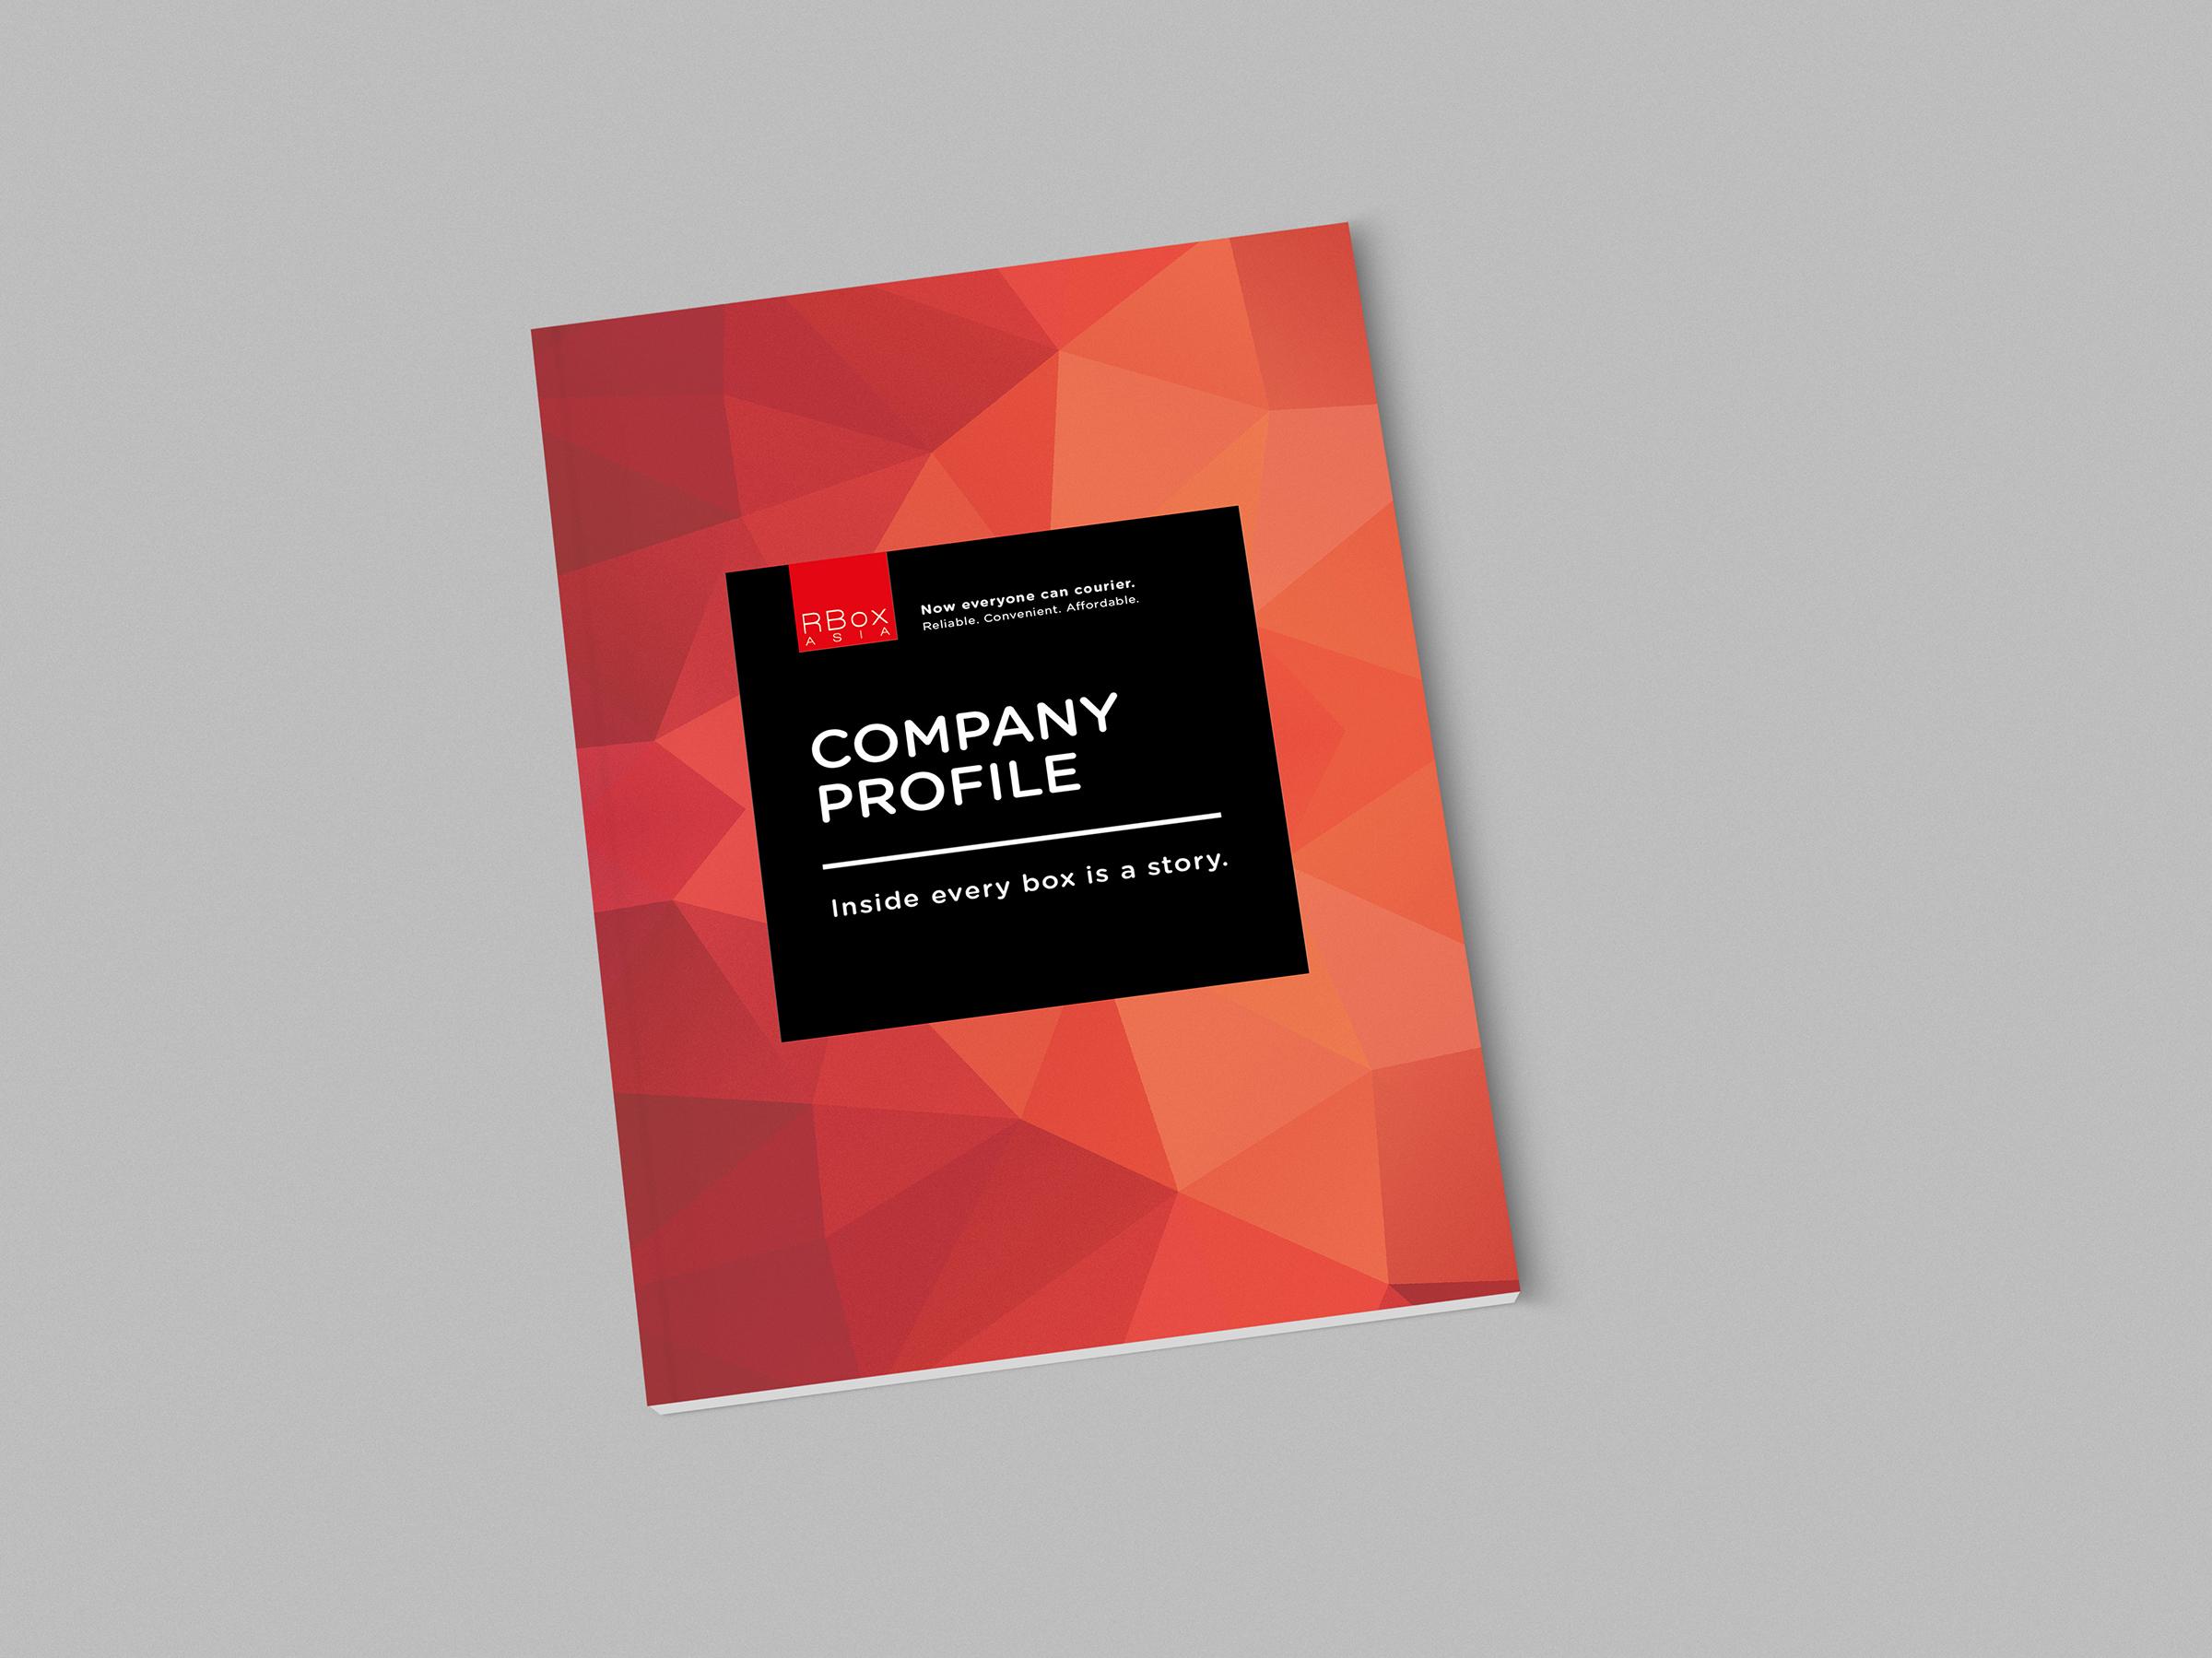 Rbox-AirAsia-Company-profile-design-cover-resized.jpg